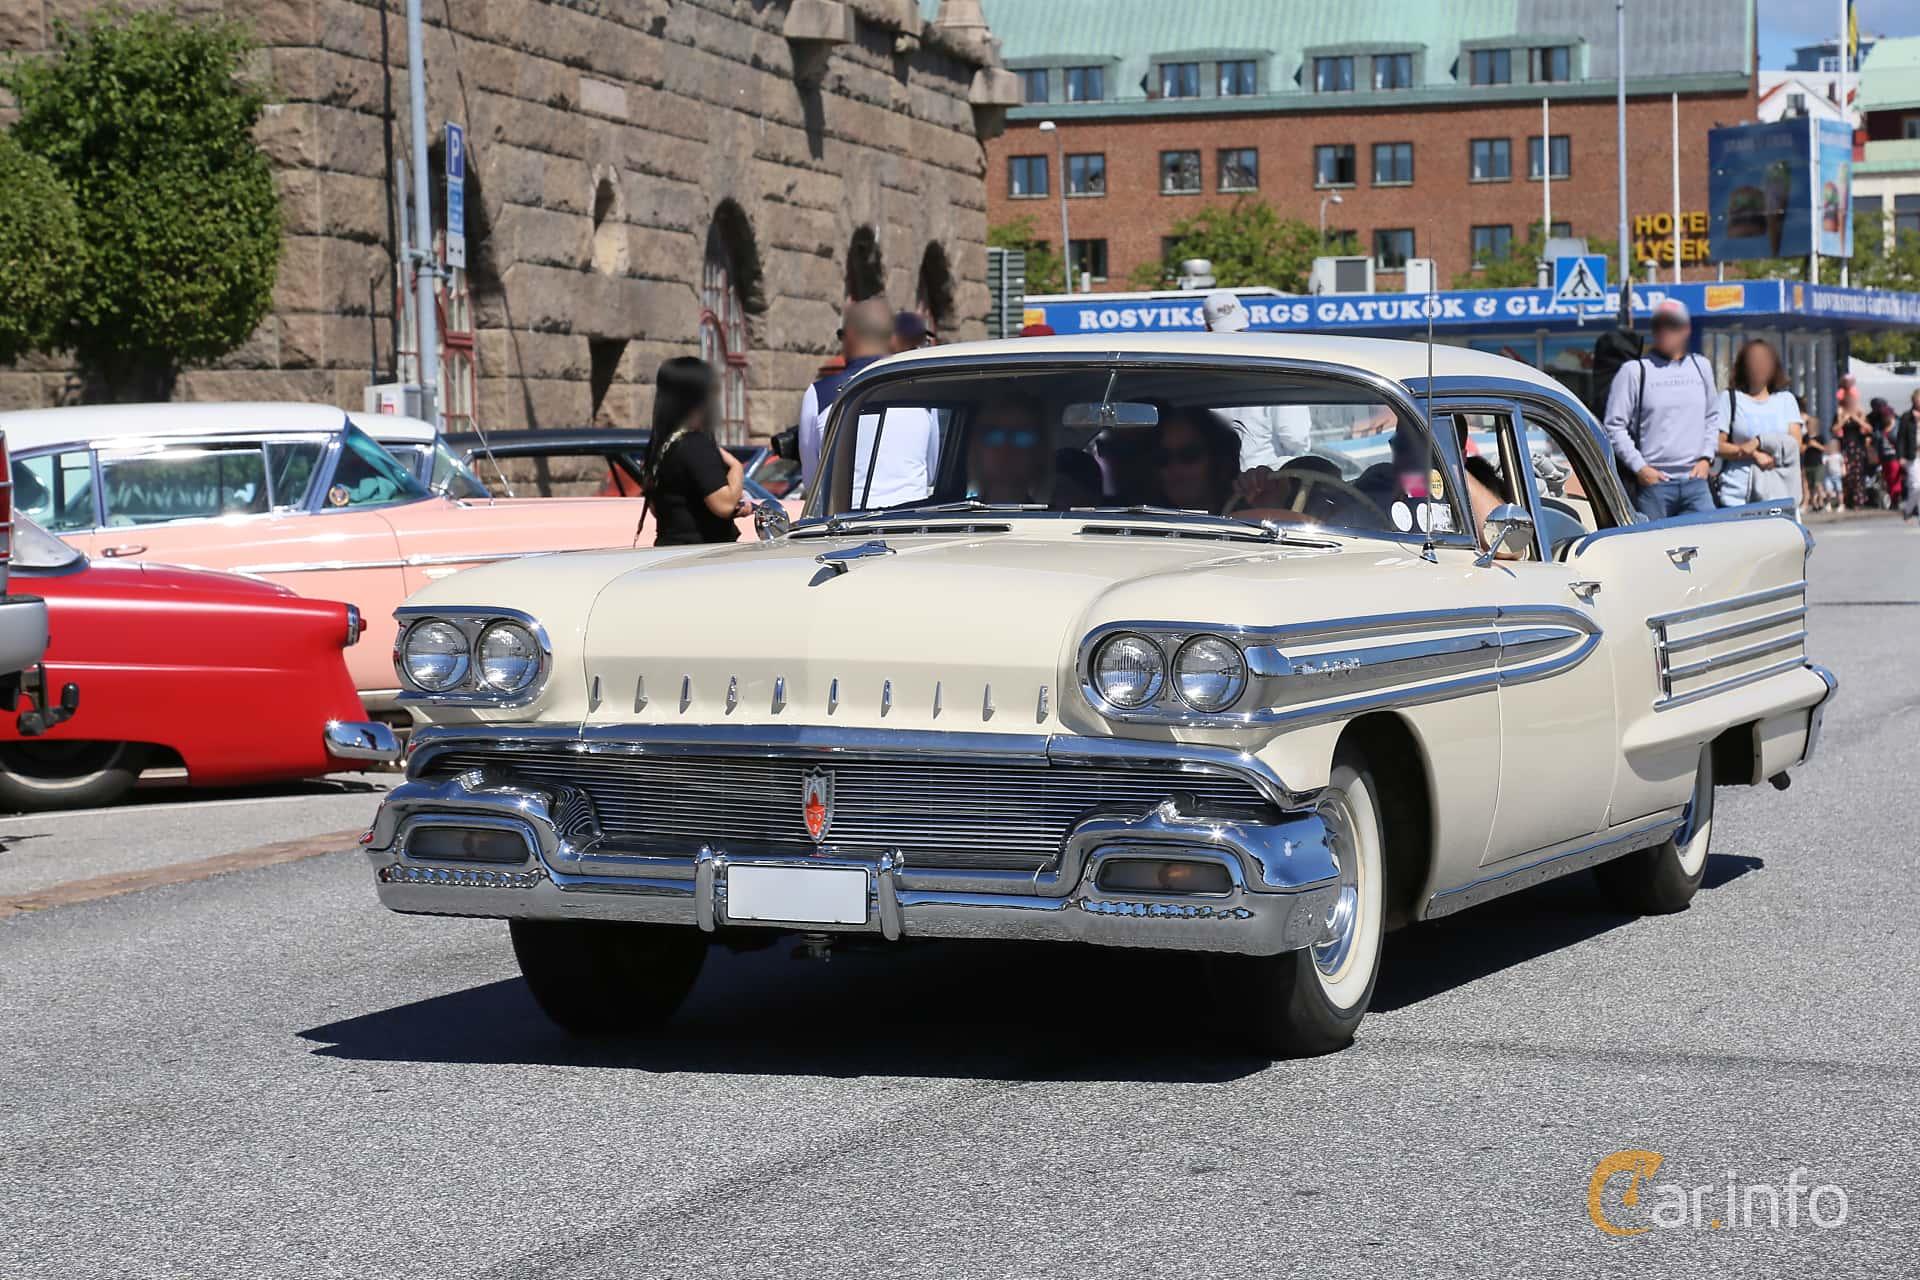 Oldsmobile Ninety-Eight Sedan 6.1 V8 Hydra-Matic, 316hk, 1958 at Cruising Lysekil 2019